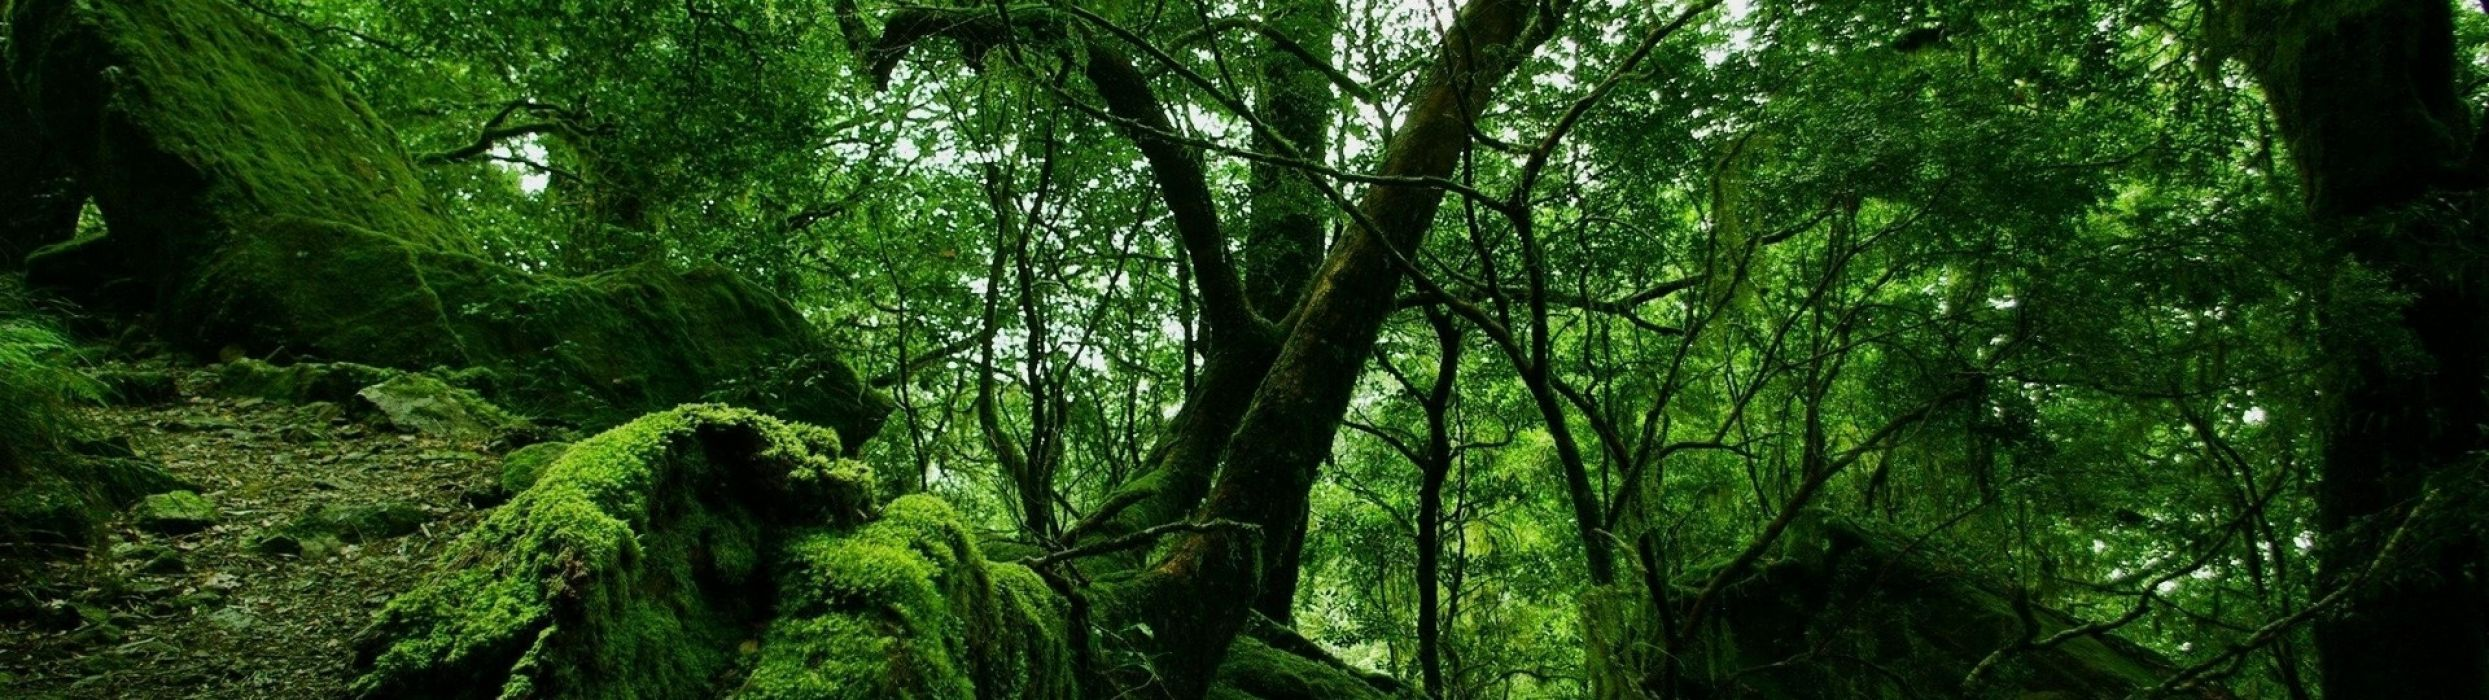 forest nature tree landscape wallpaper